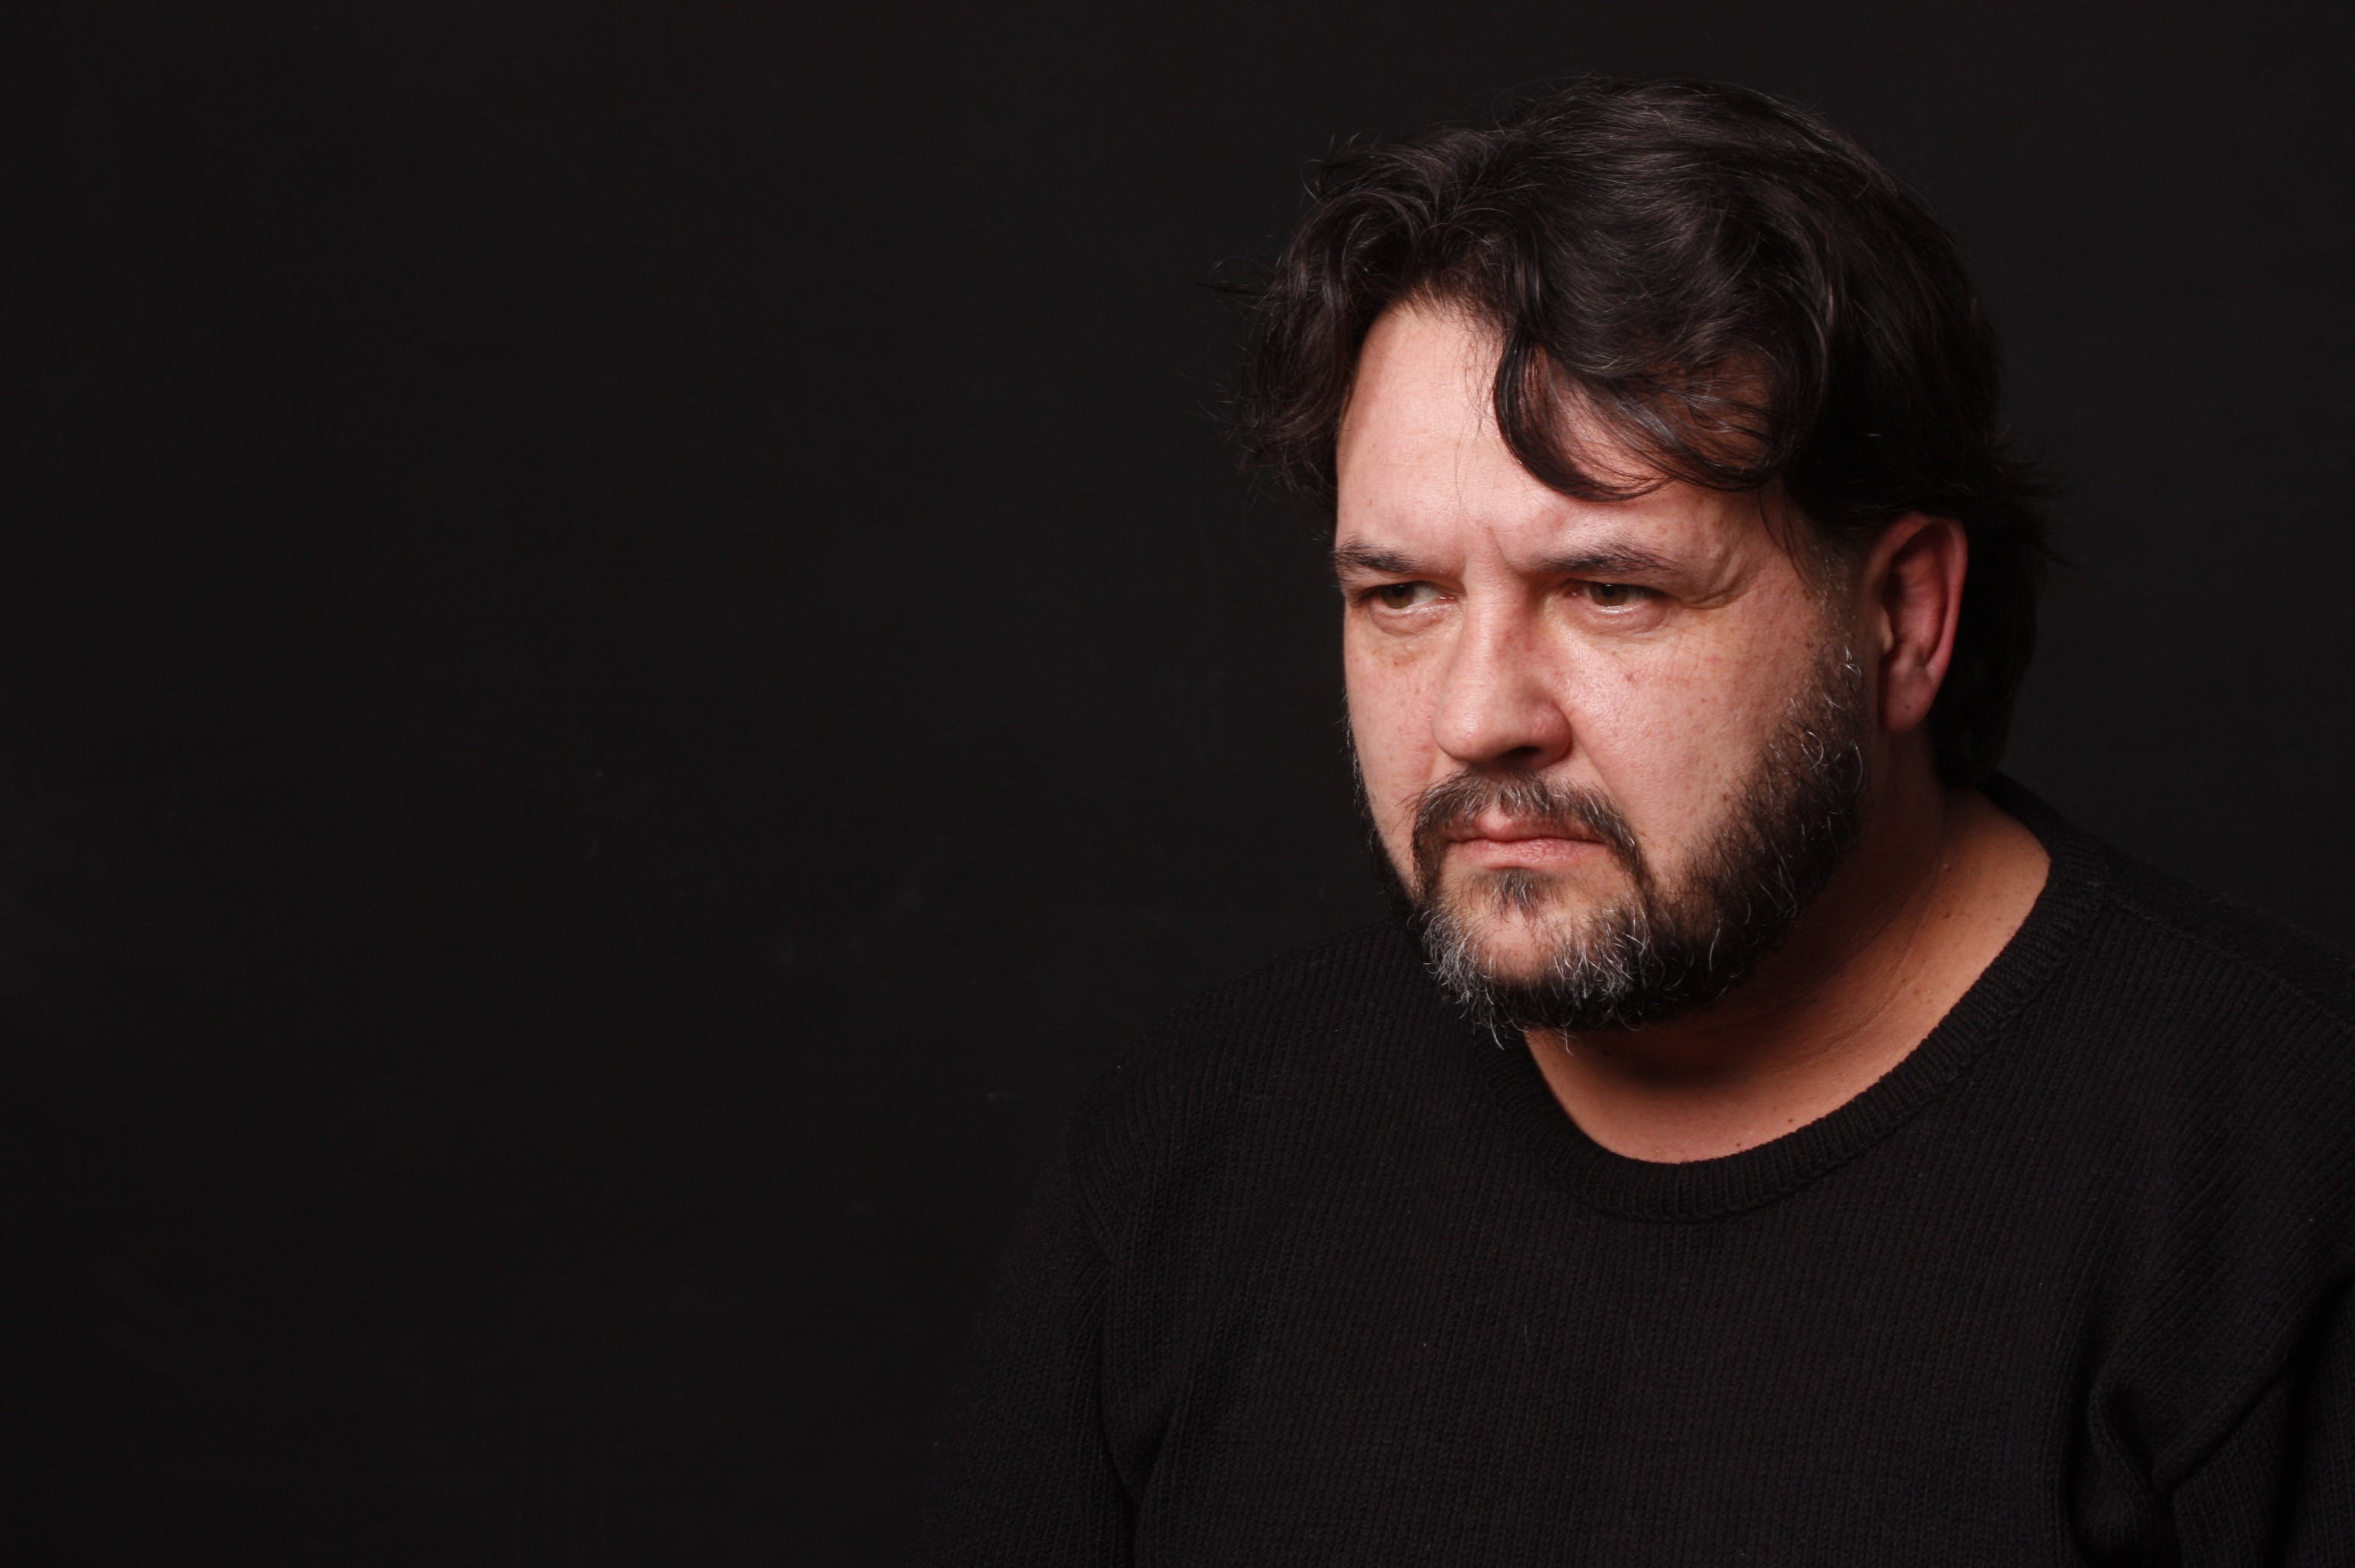 Free stock photo of beard, black background, confident, dark